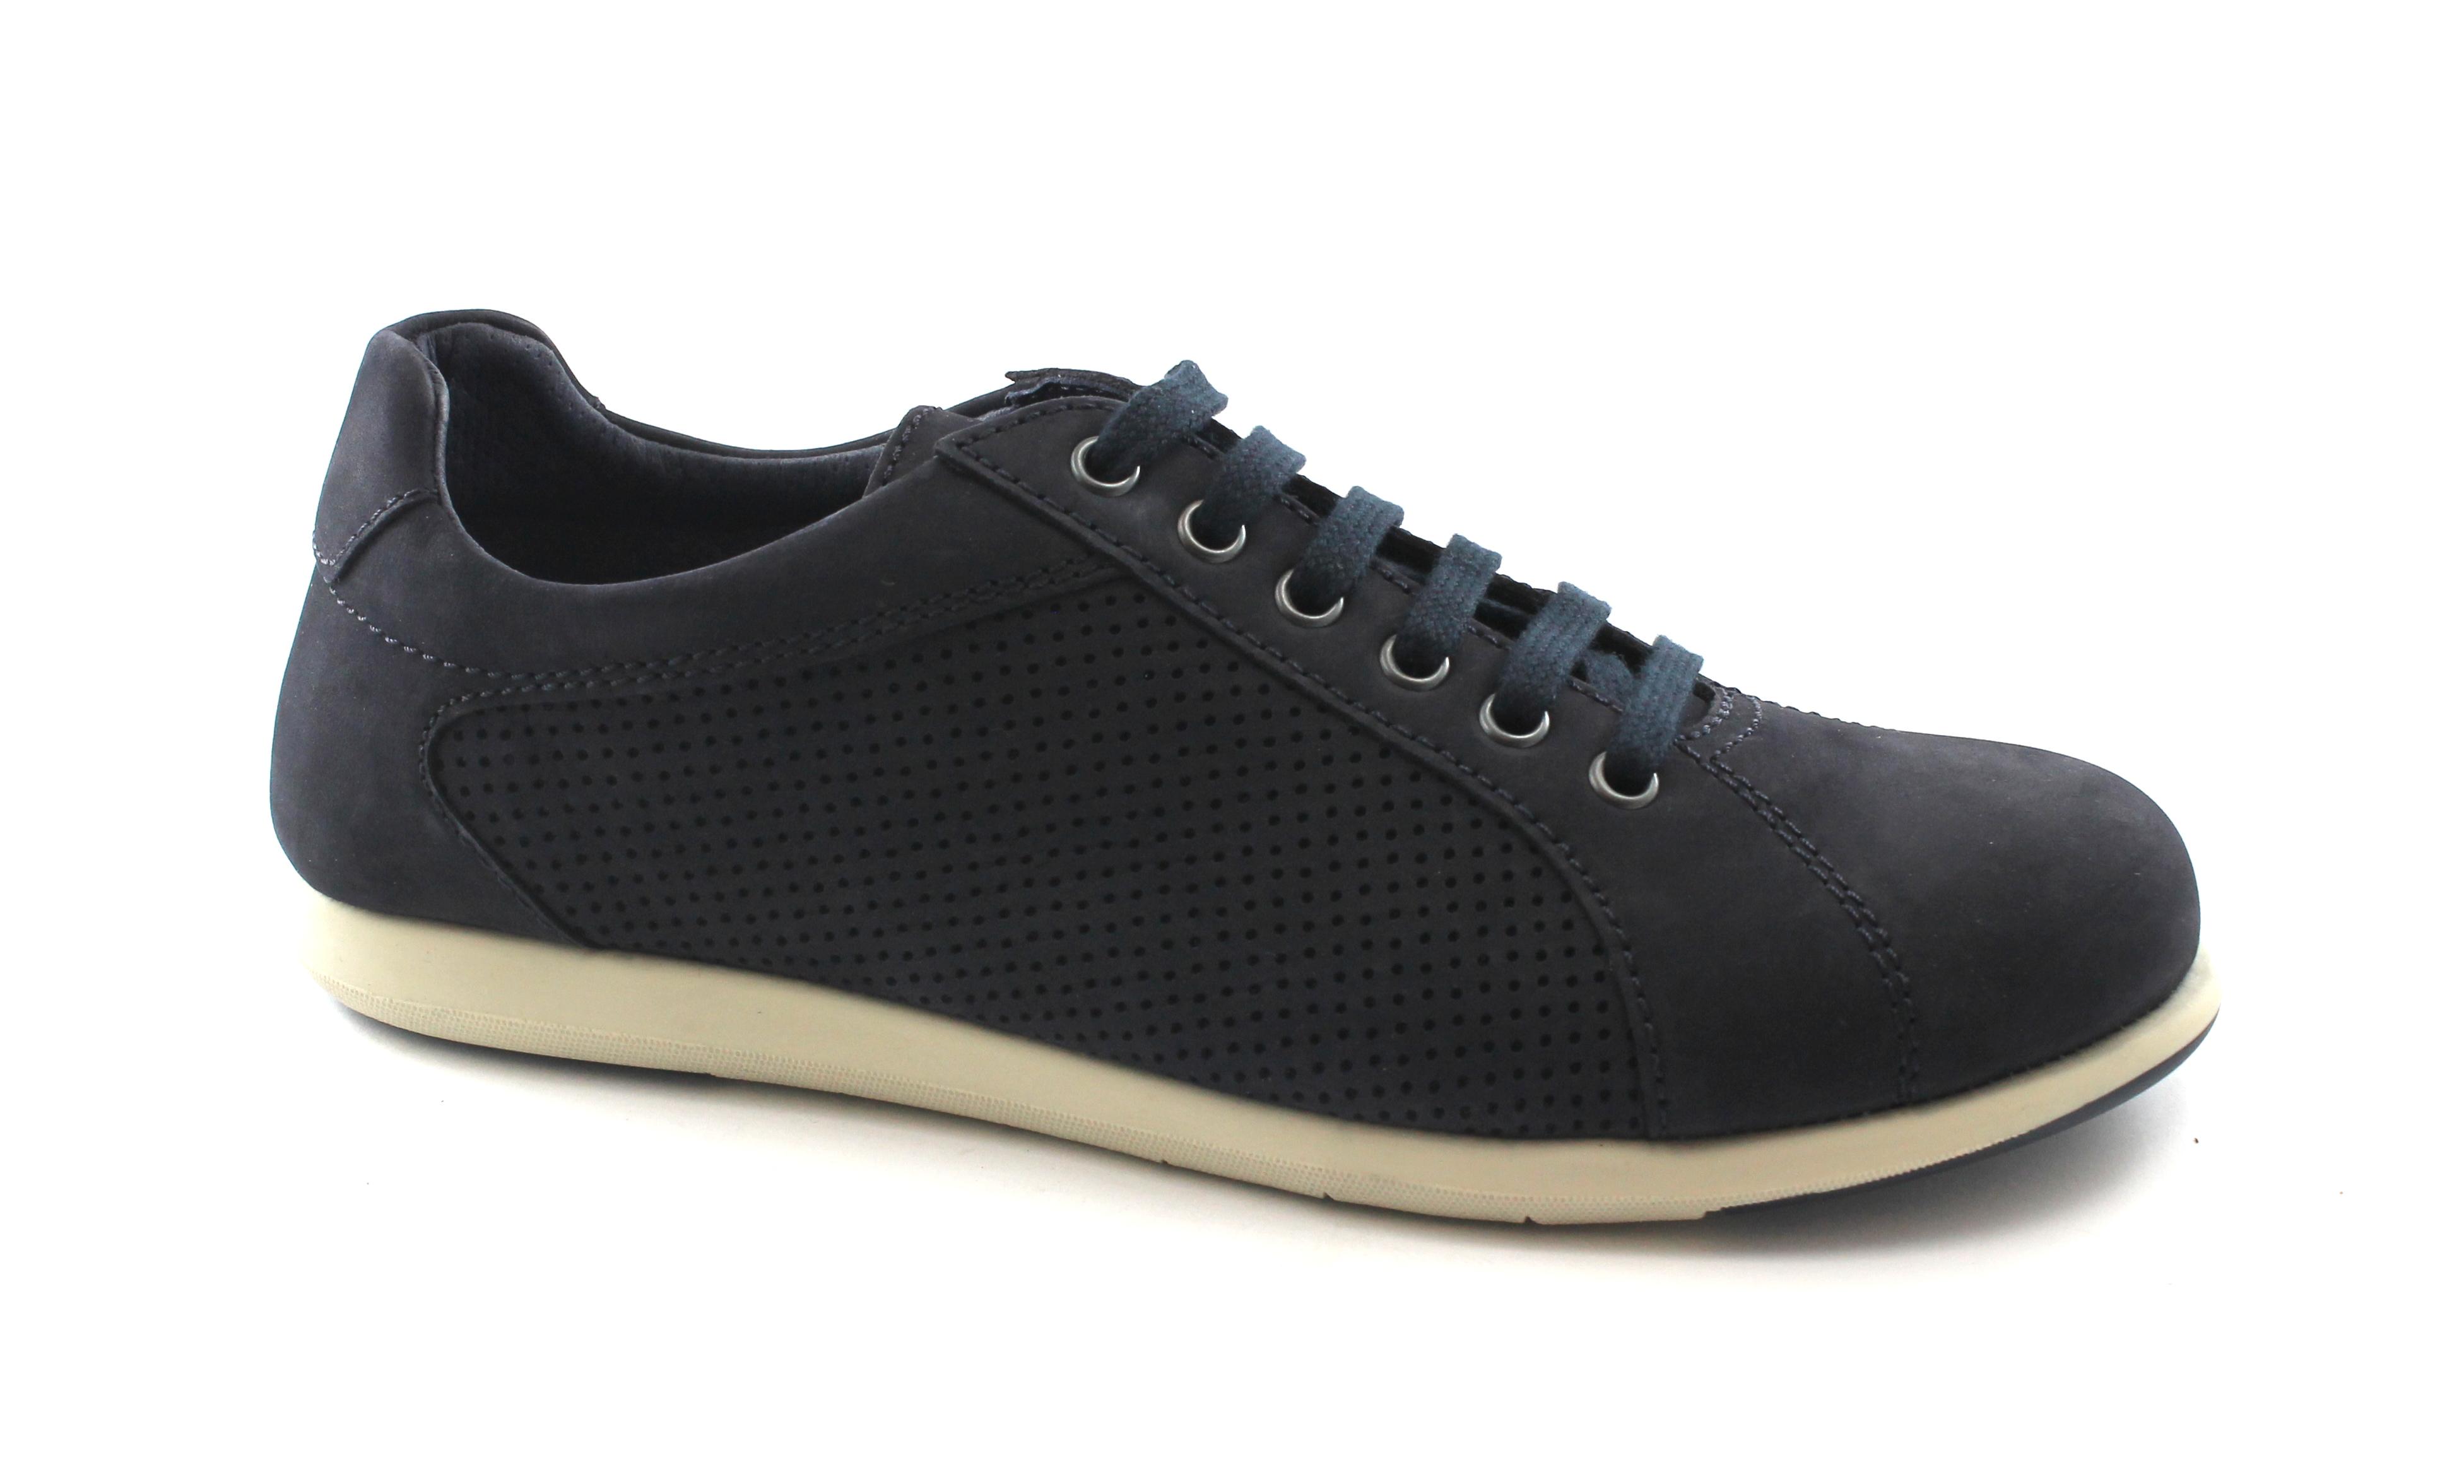 Scarpe casual da uomo  FRAU FX 11E3 navy blu scarpe uomo sneakers sportive lacci